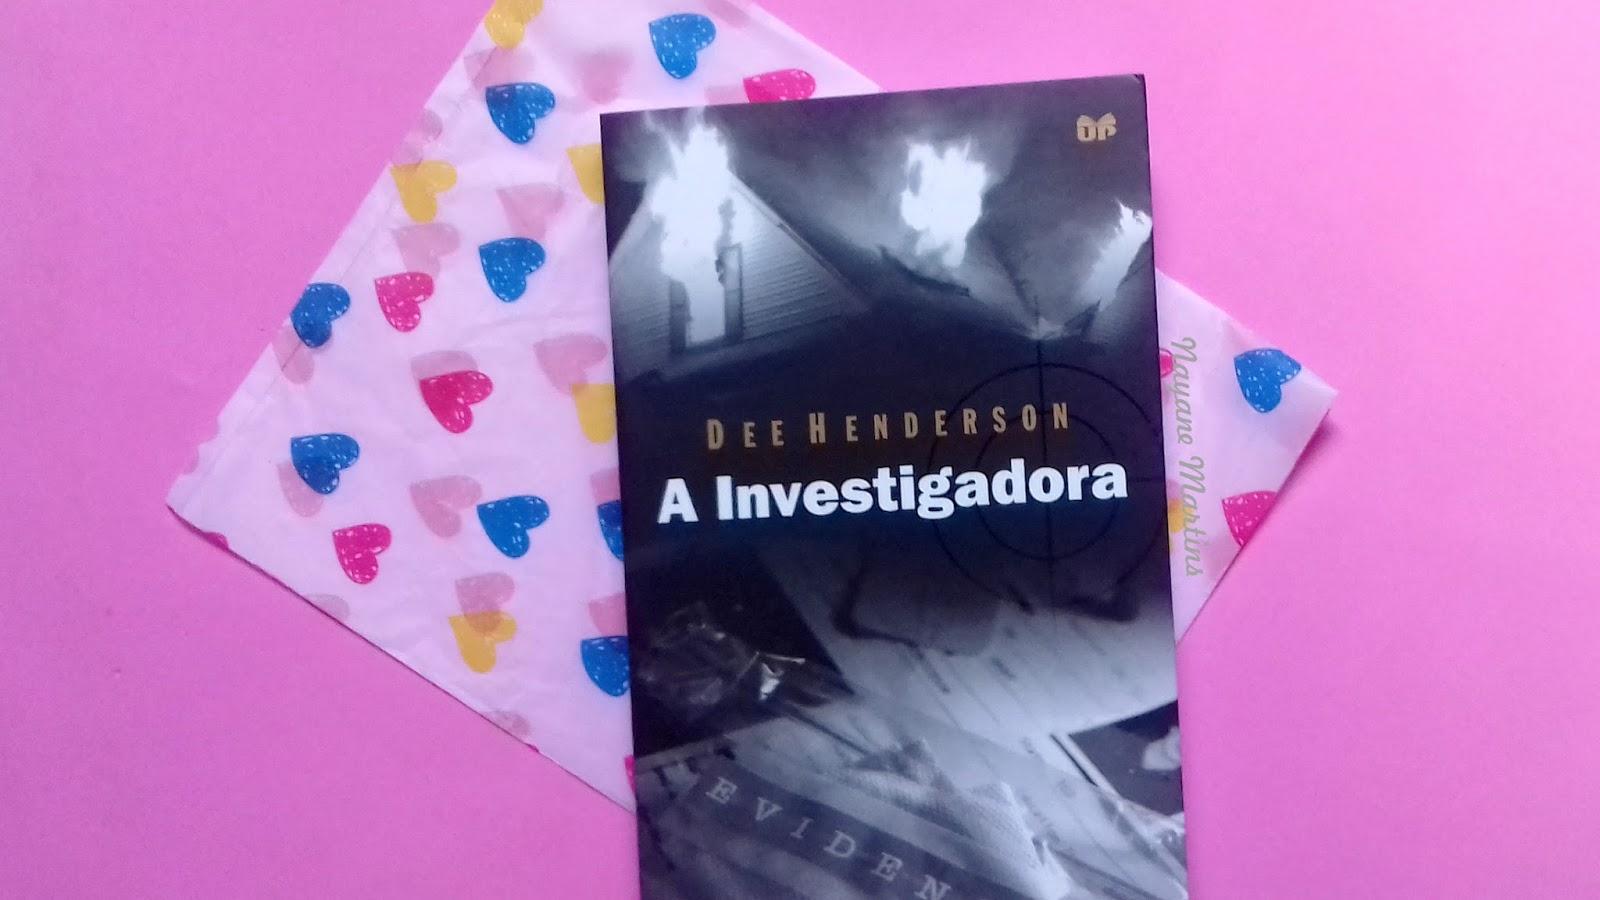 A-Investigadora-Dee-Henderson